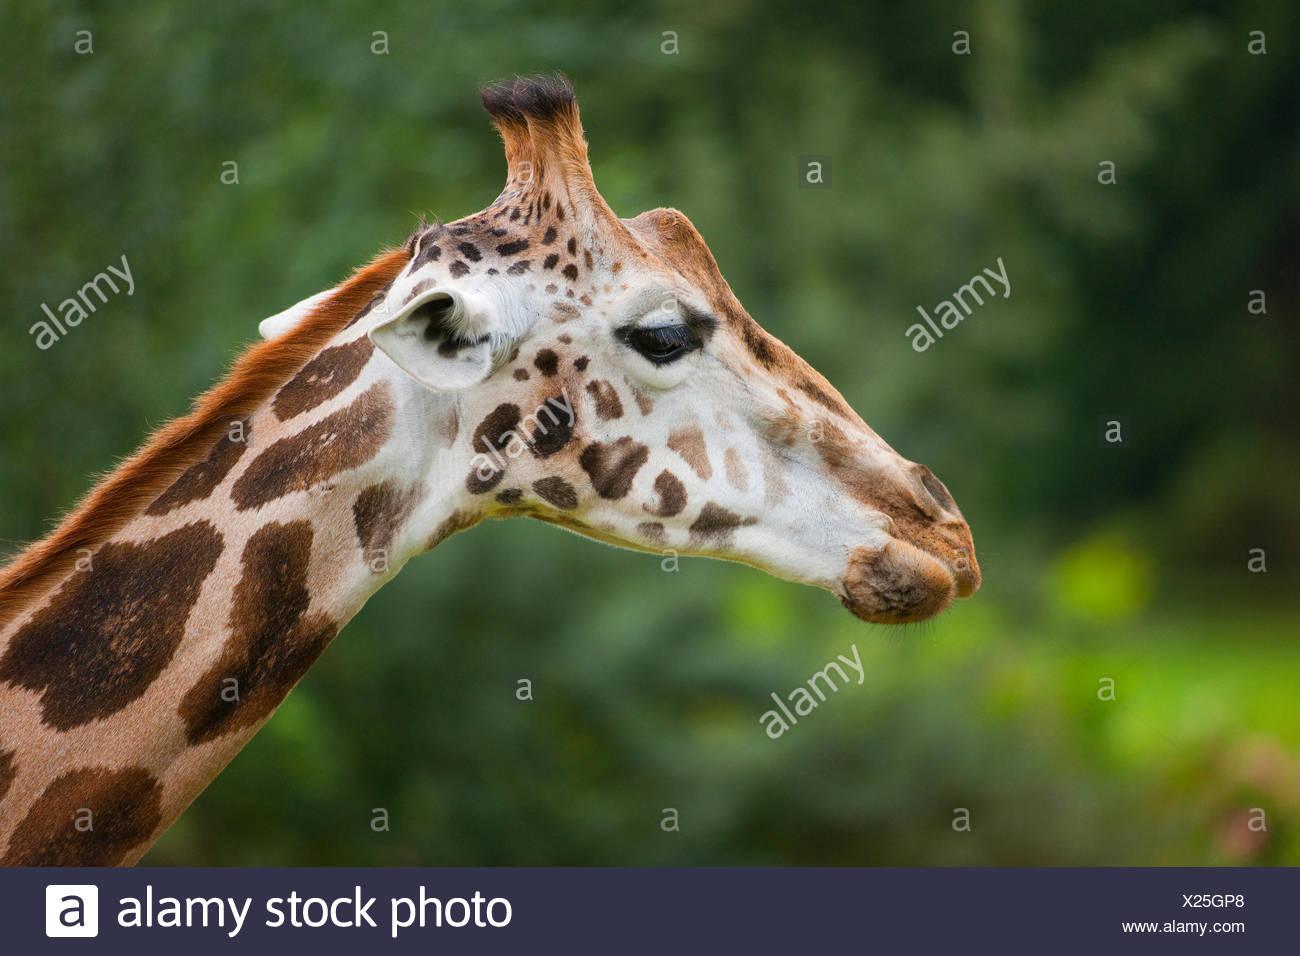 Rothschild's Giraffe (Giraffa camelopardalis rothschildi), captive, Saxony, Germany - Stock Image